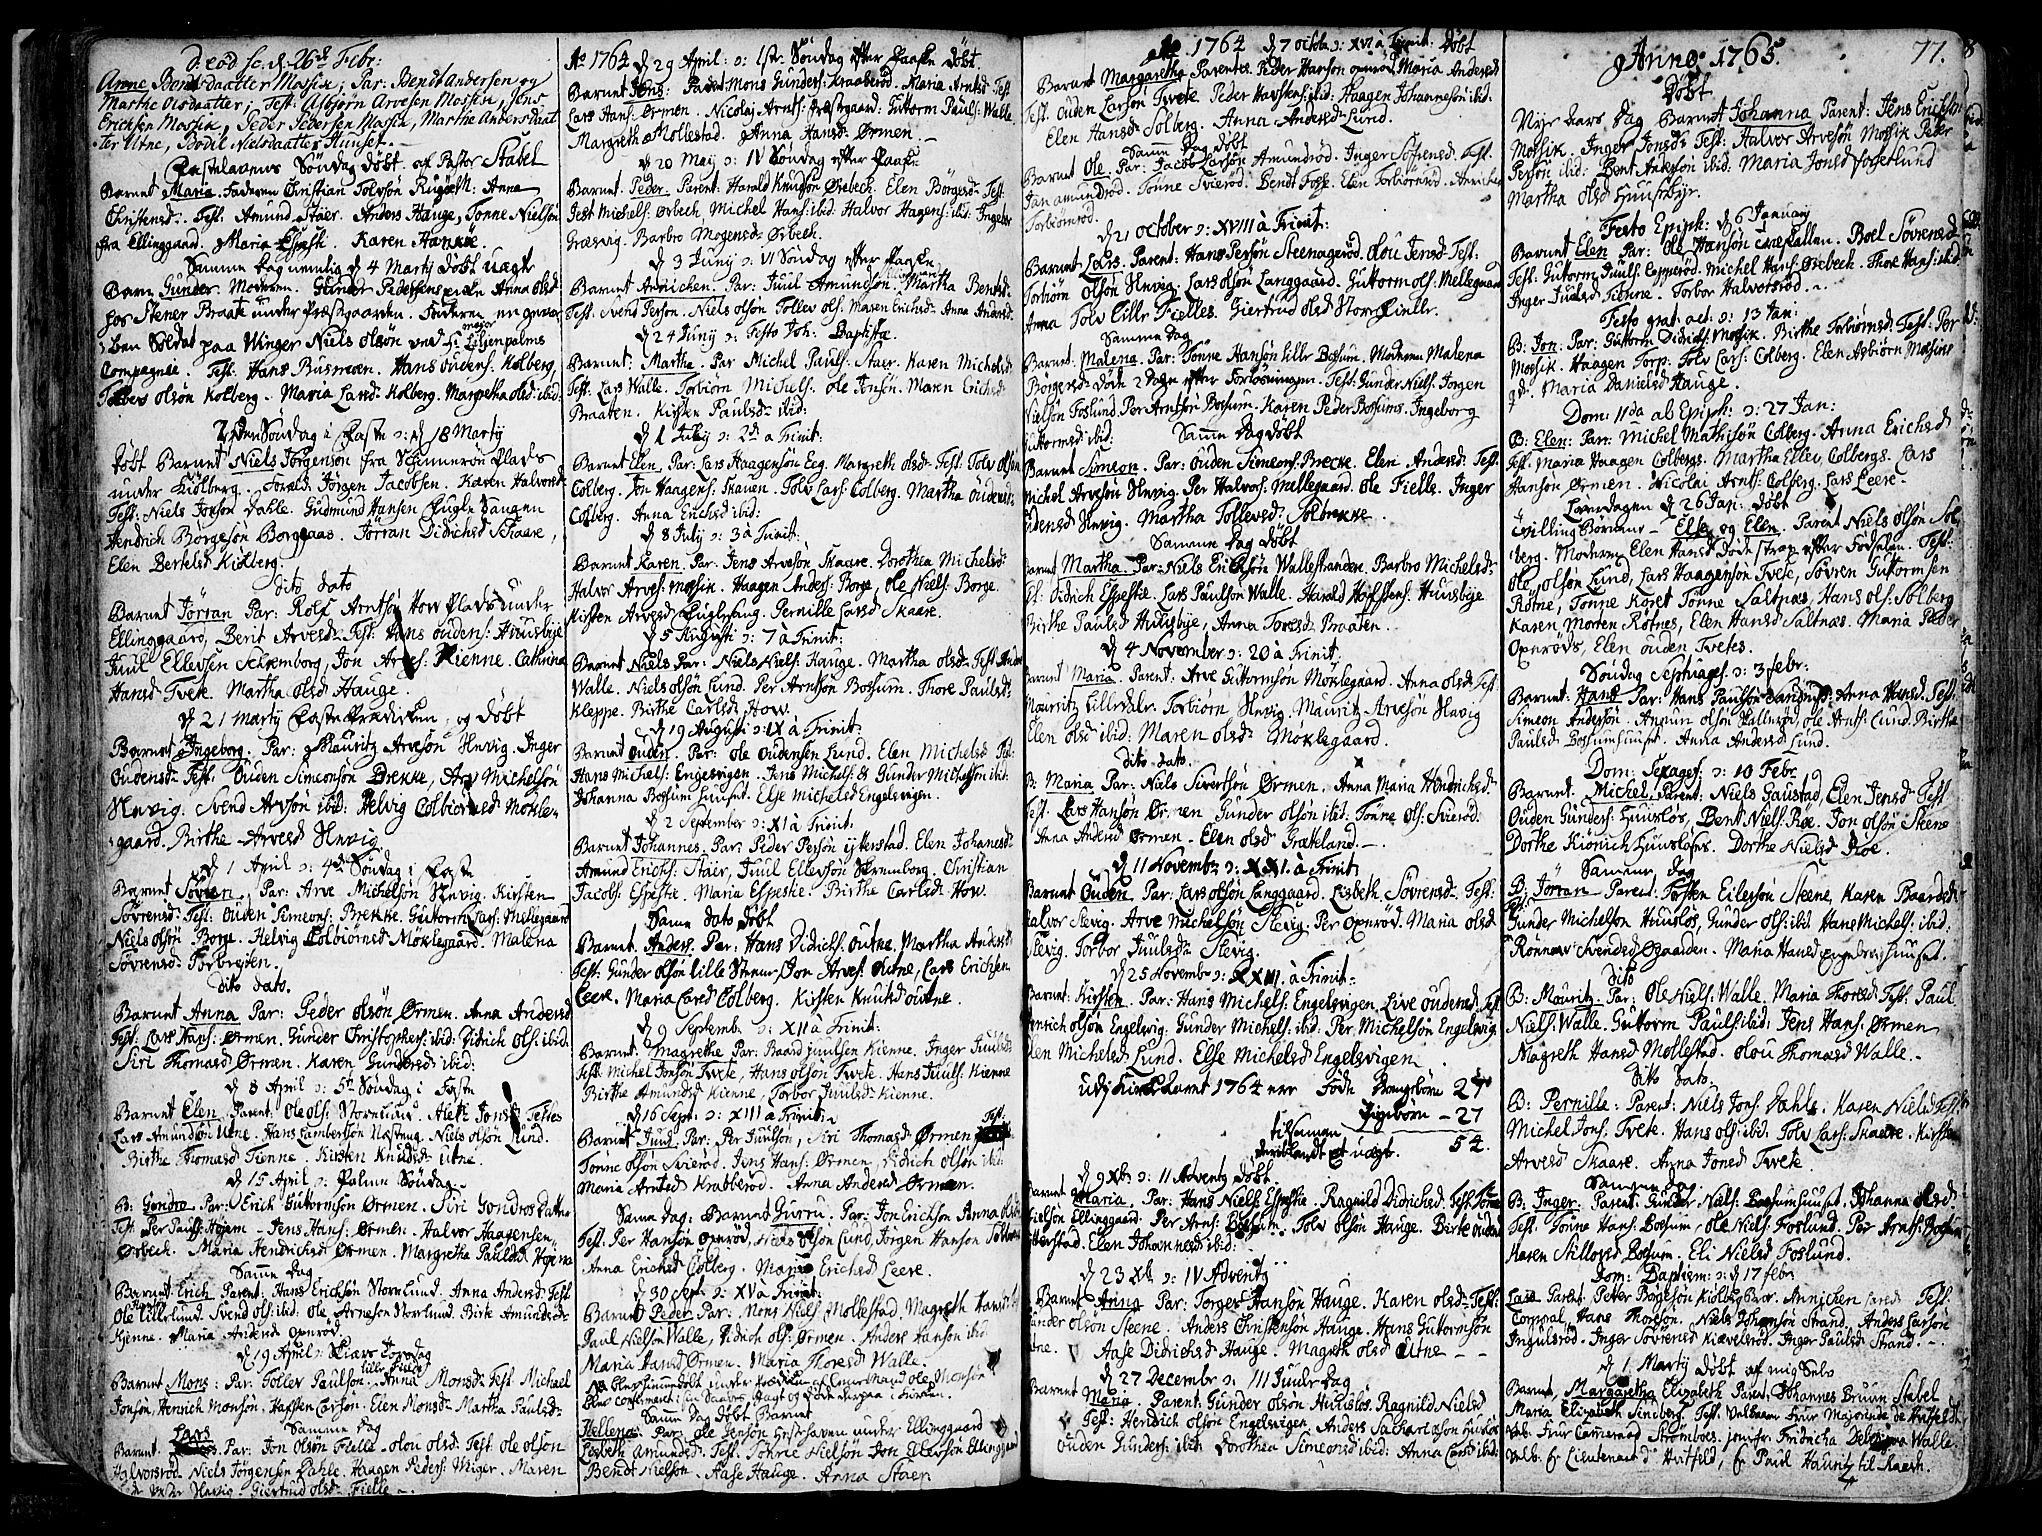 SAO, Onsøy prestekontor Kirkebøker, F/Fa/L0001: Ministerialbok nr. I 1, 1733-1814, s. 77